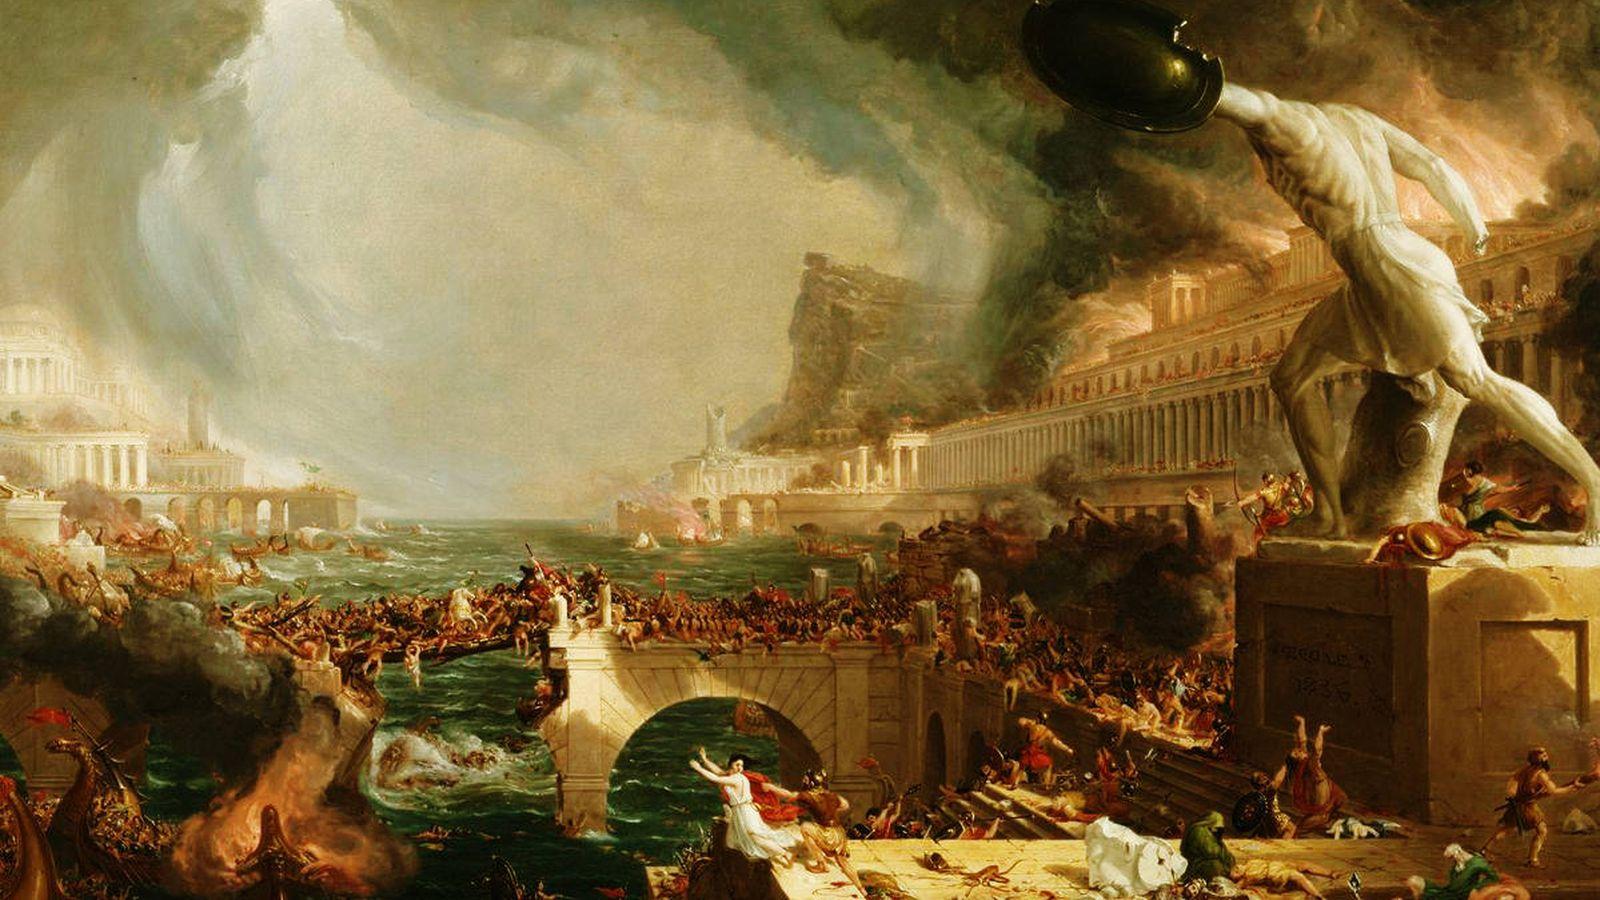 Foto: 'The Course of Empire - Destruction', por Thomas Cole (1836)